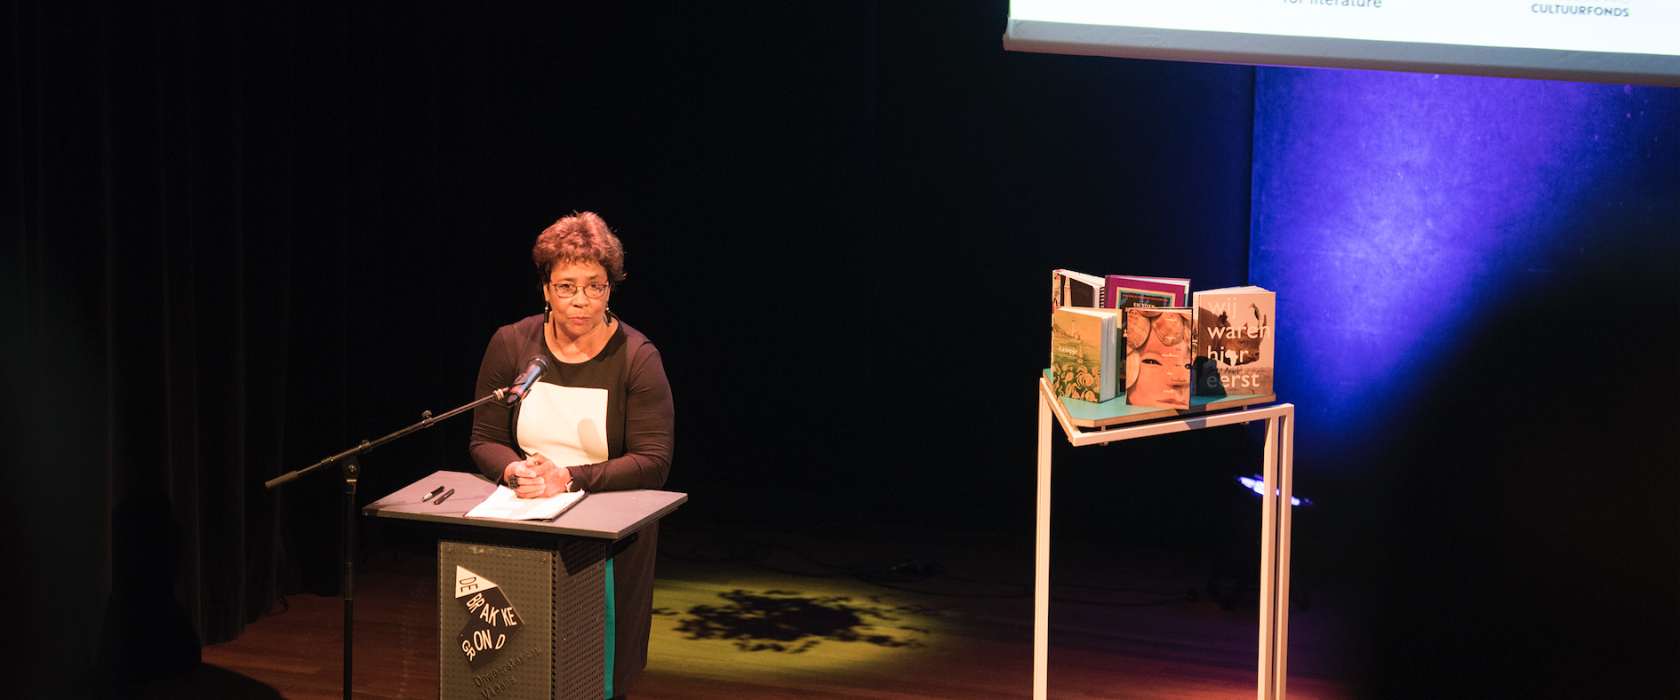 Juryrapport Woutertje Pieterse Prijs 2018